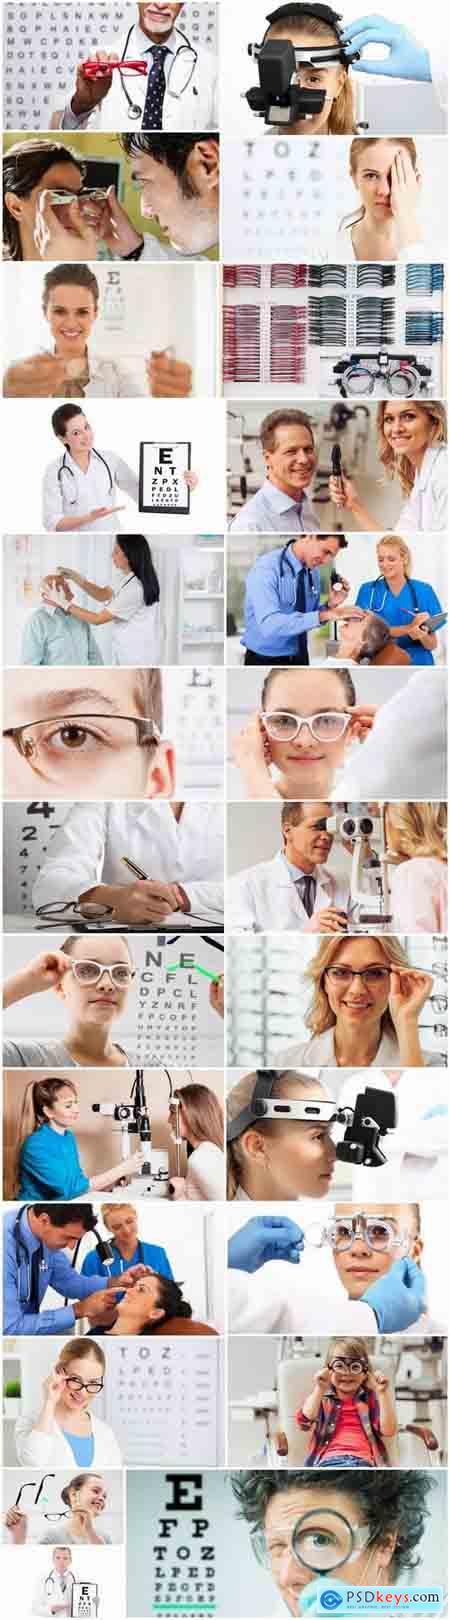 Glasses optometrist poor eyesight eye treatment 25 HQ Jpeg